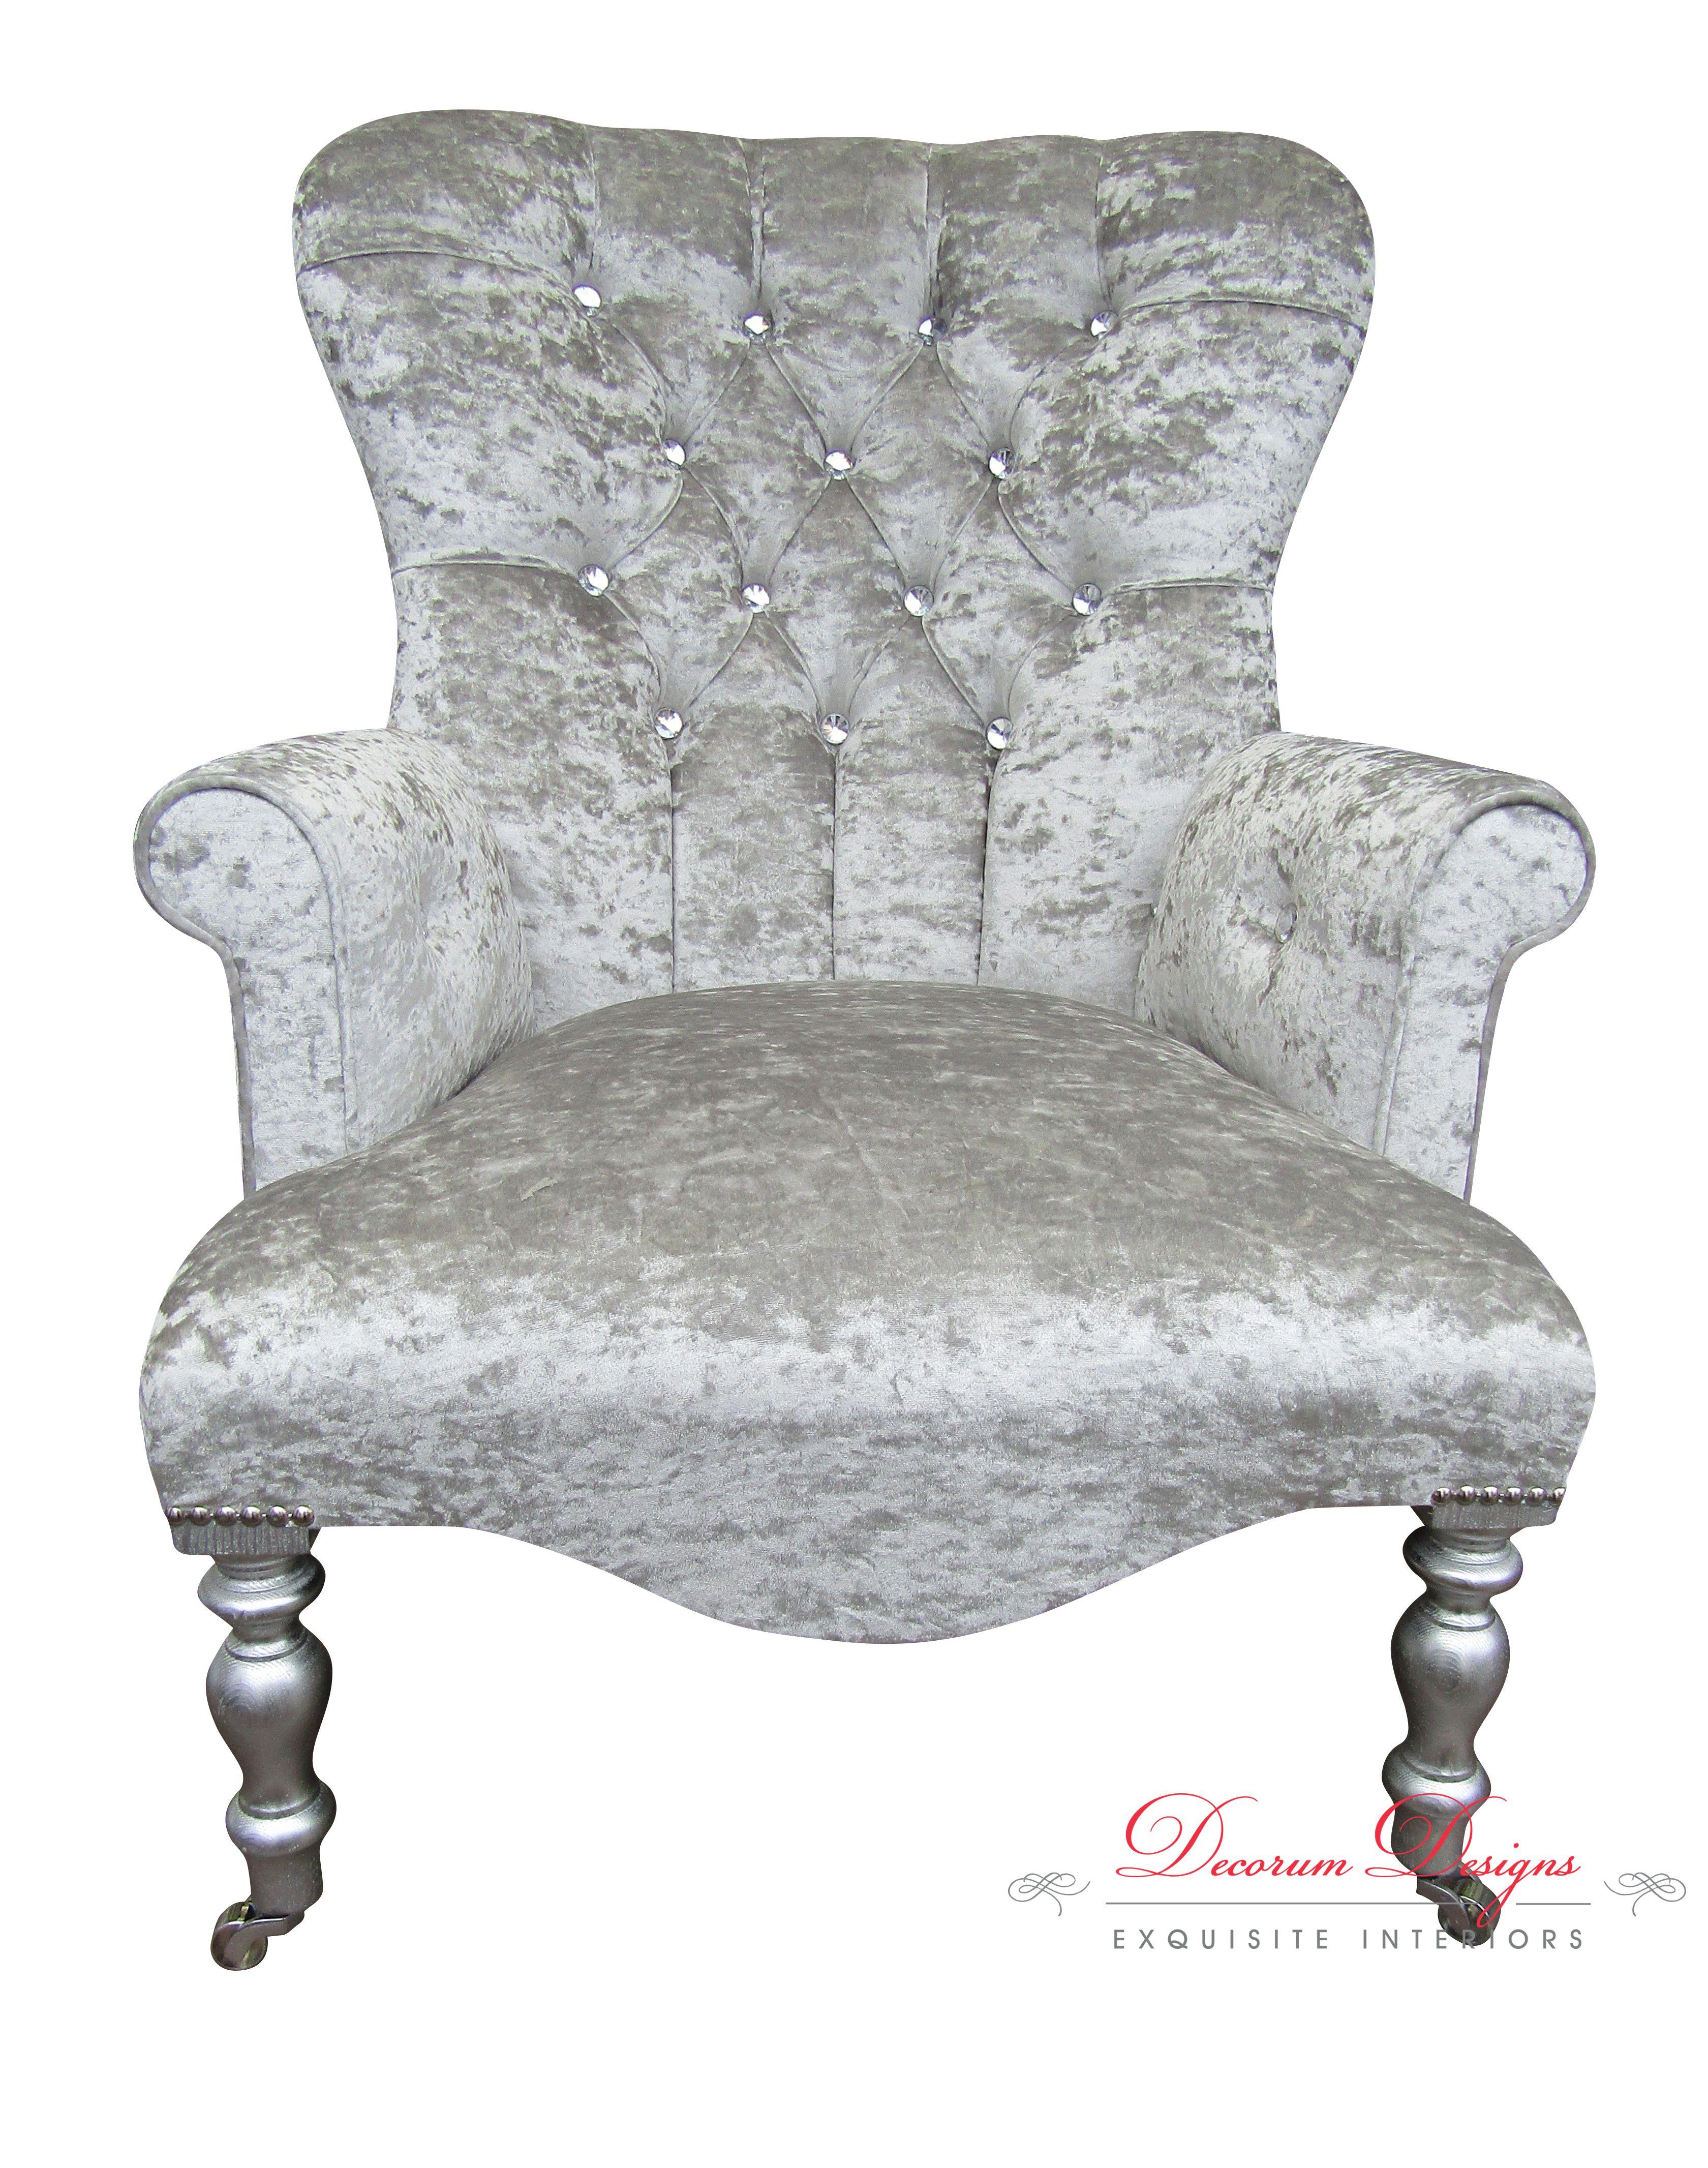 Bespoke Crushed Velvet Silver Diamonte Button Back Arm Chair